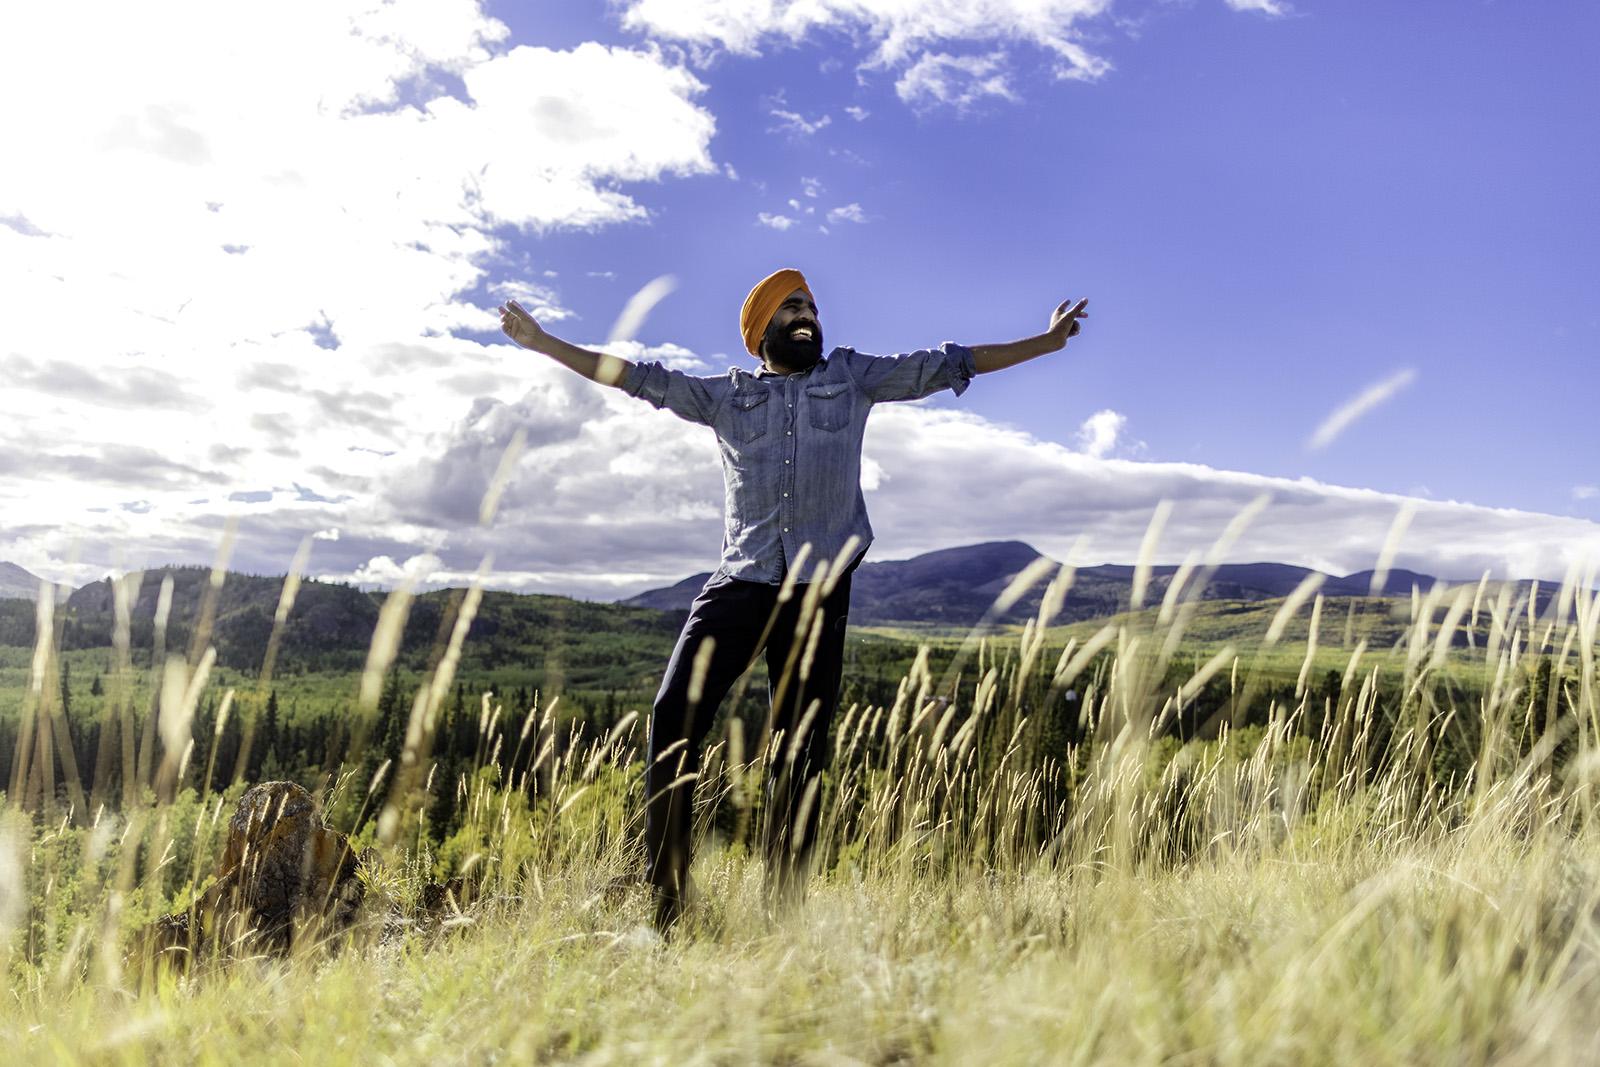 Gurdeep Pandher dances in Canada in Sept. 2021. Photo by Stewart Burnett Photography